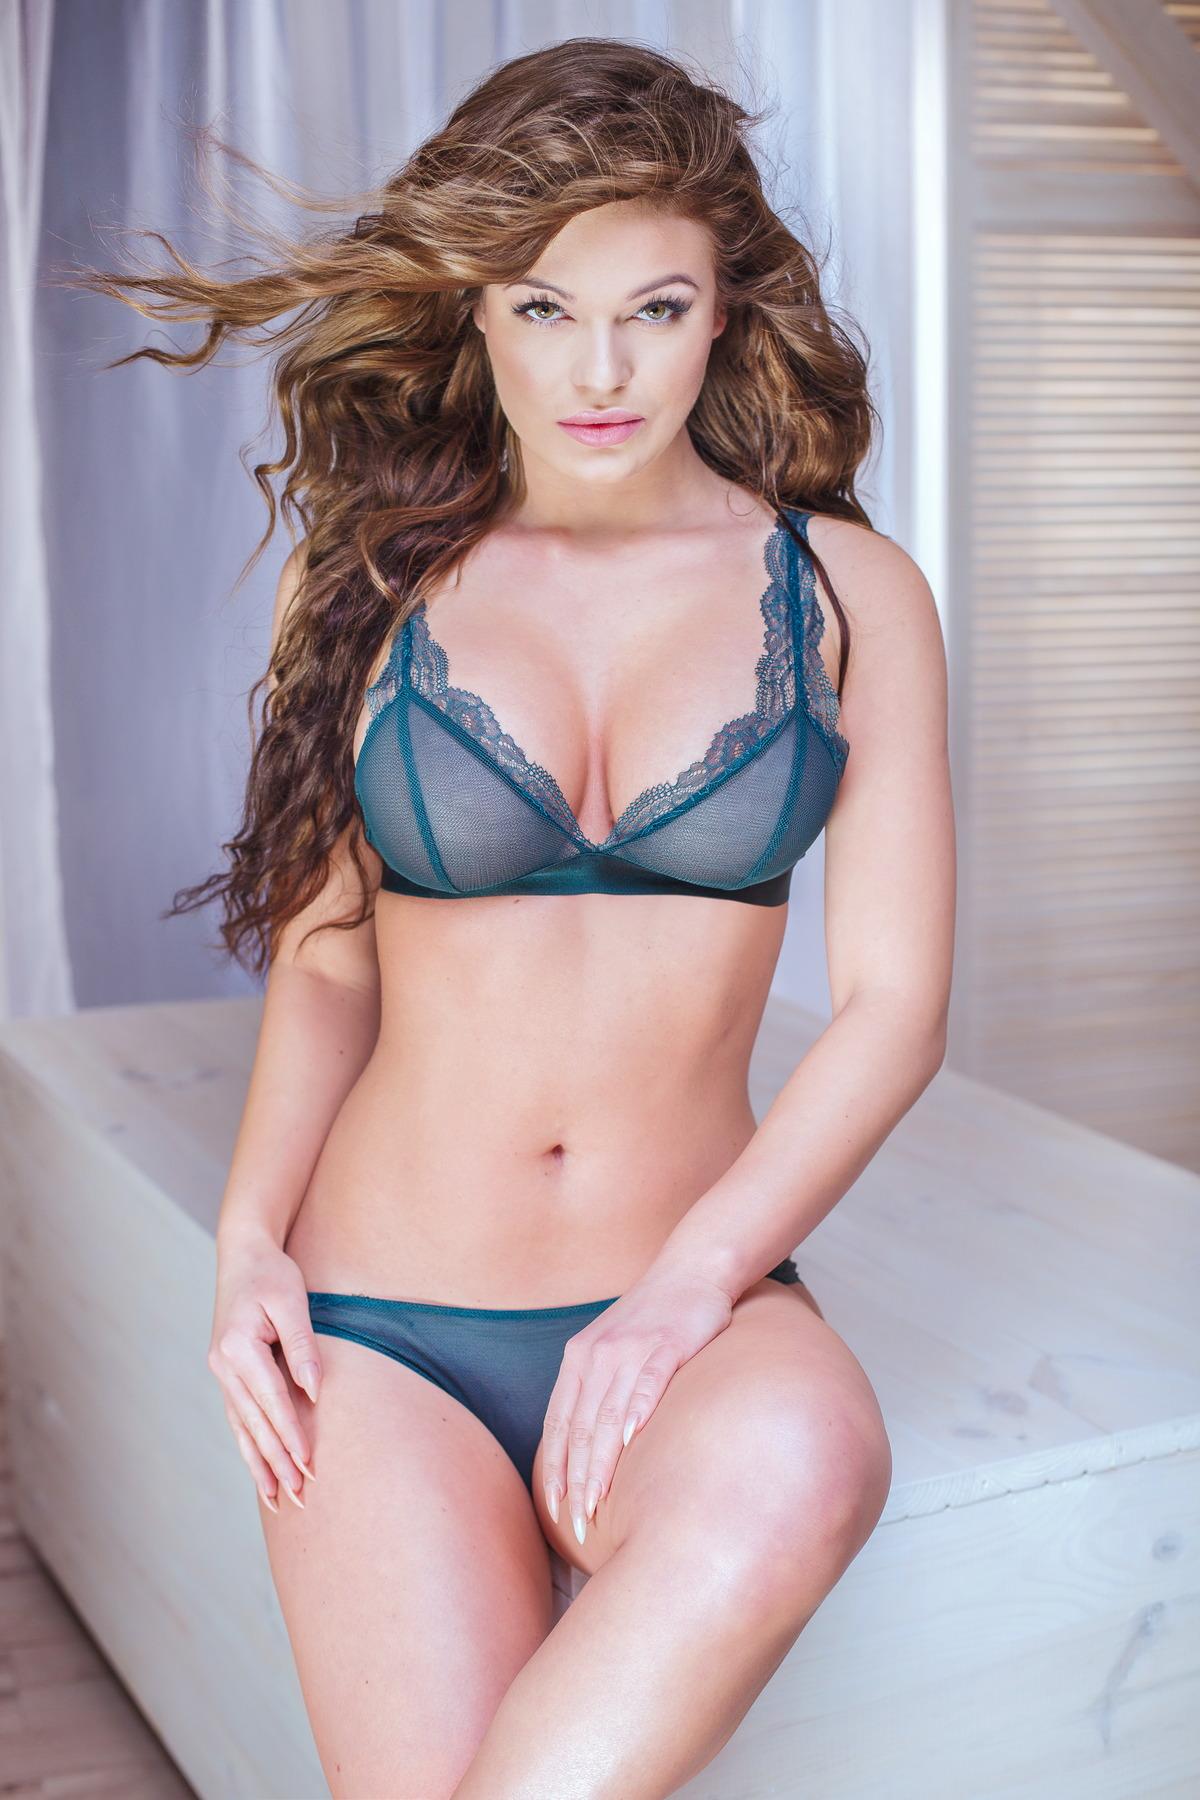 Sexy Girl im Bad